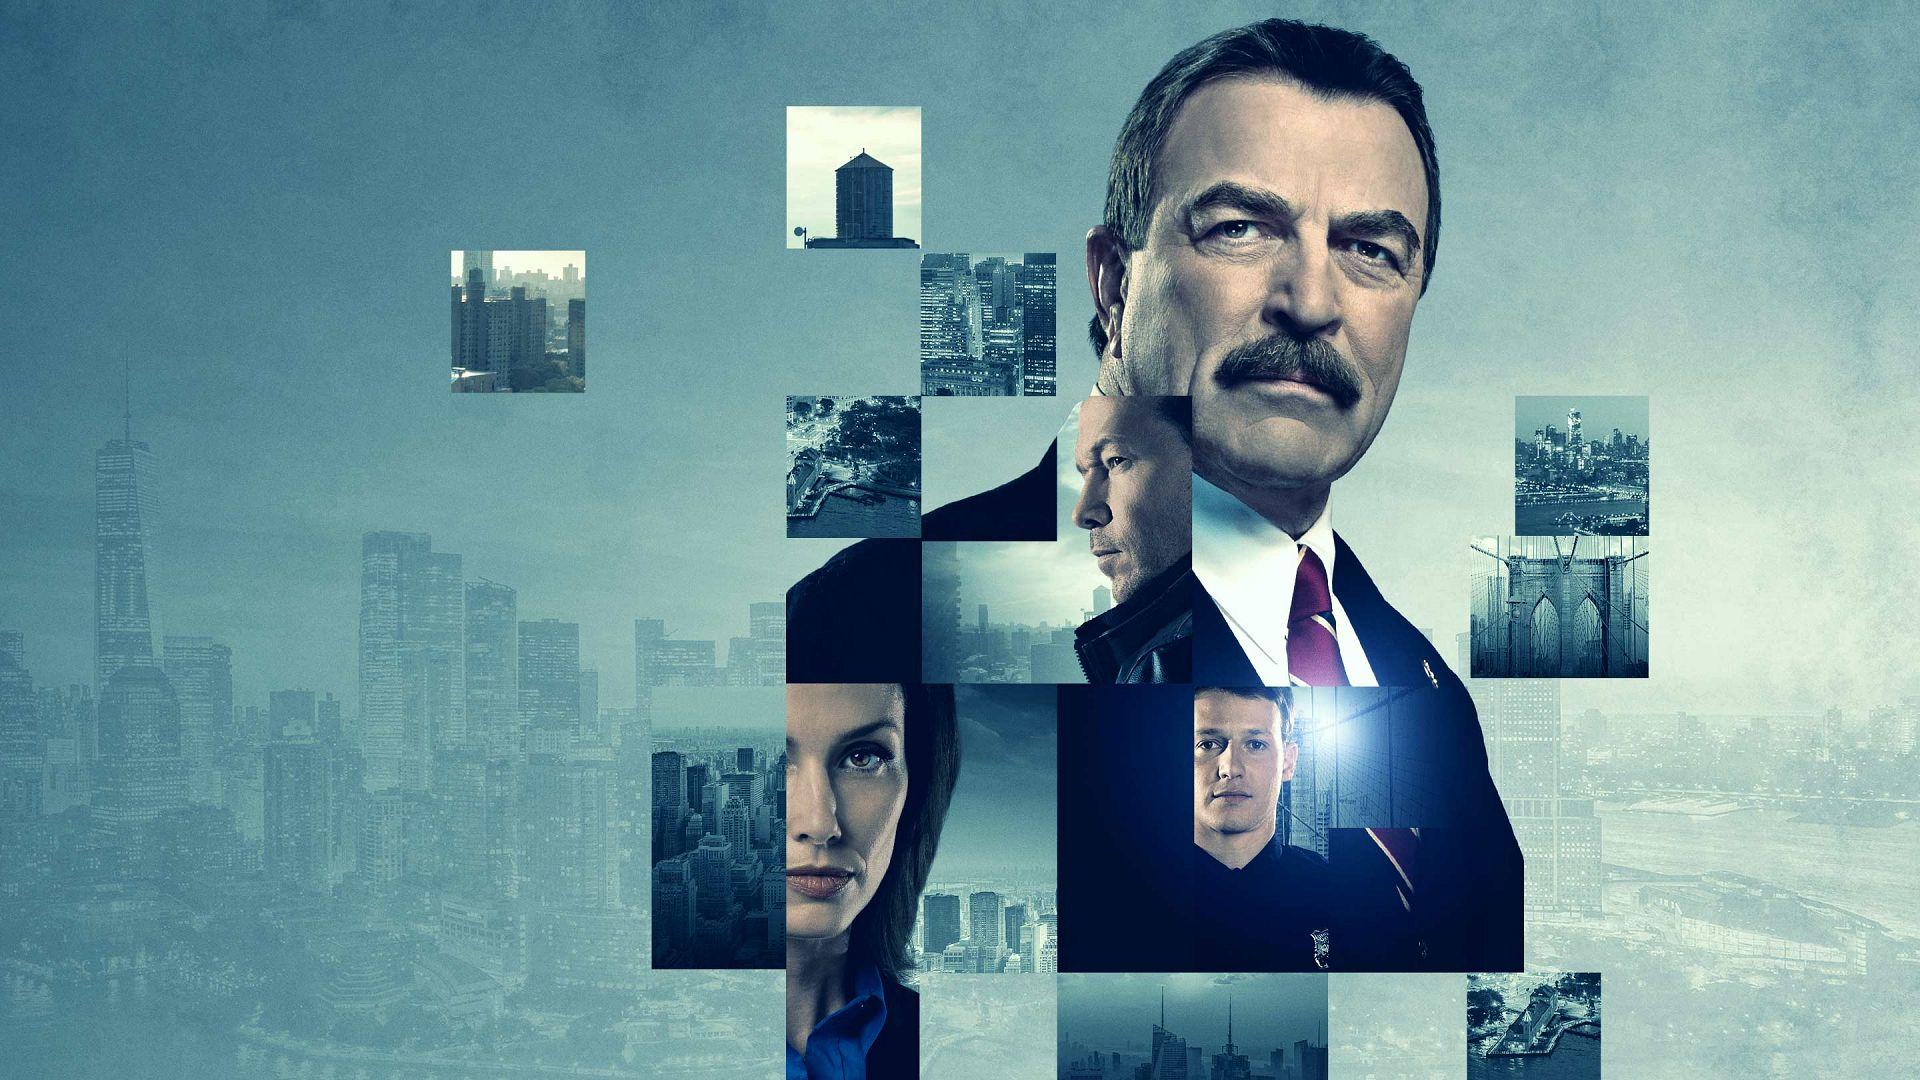 Blue Bloods Season 11 Episode 6